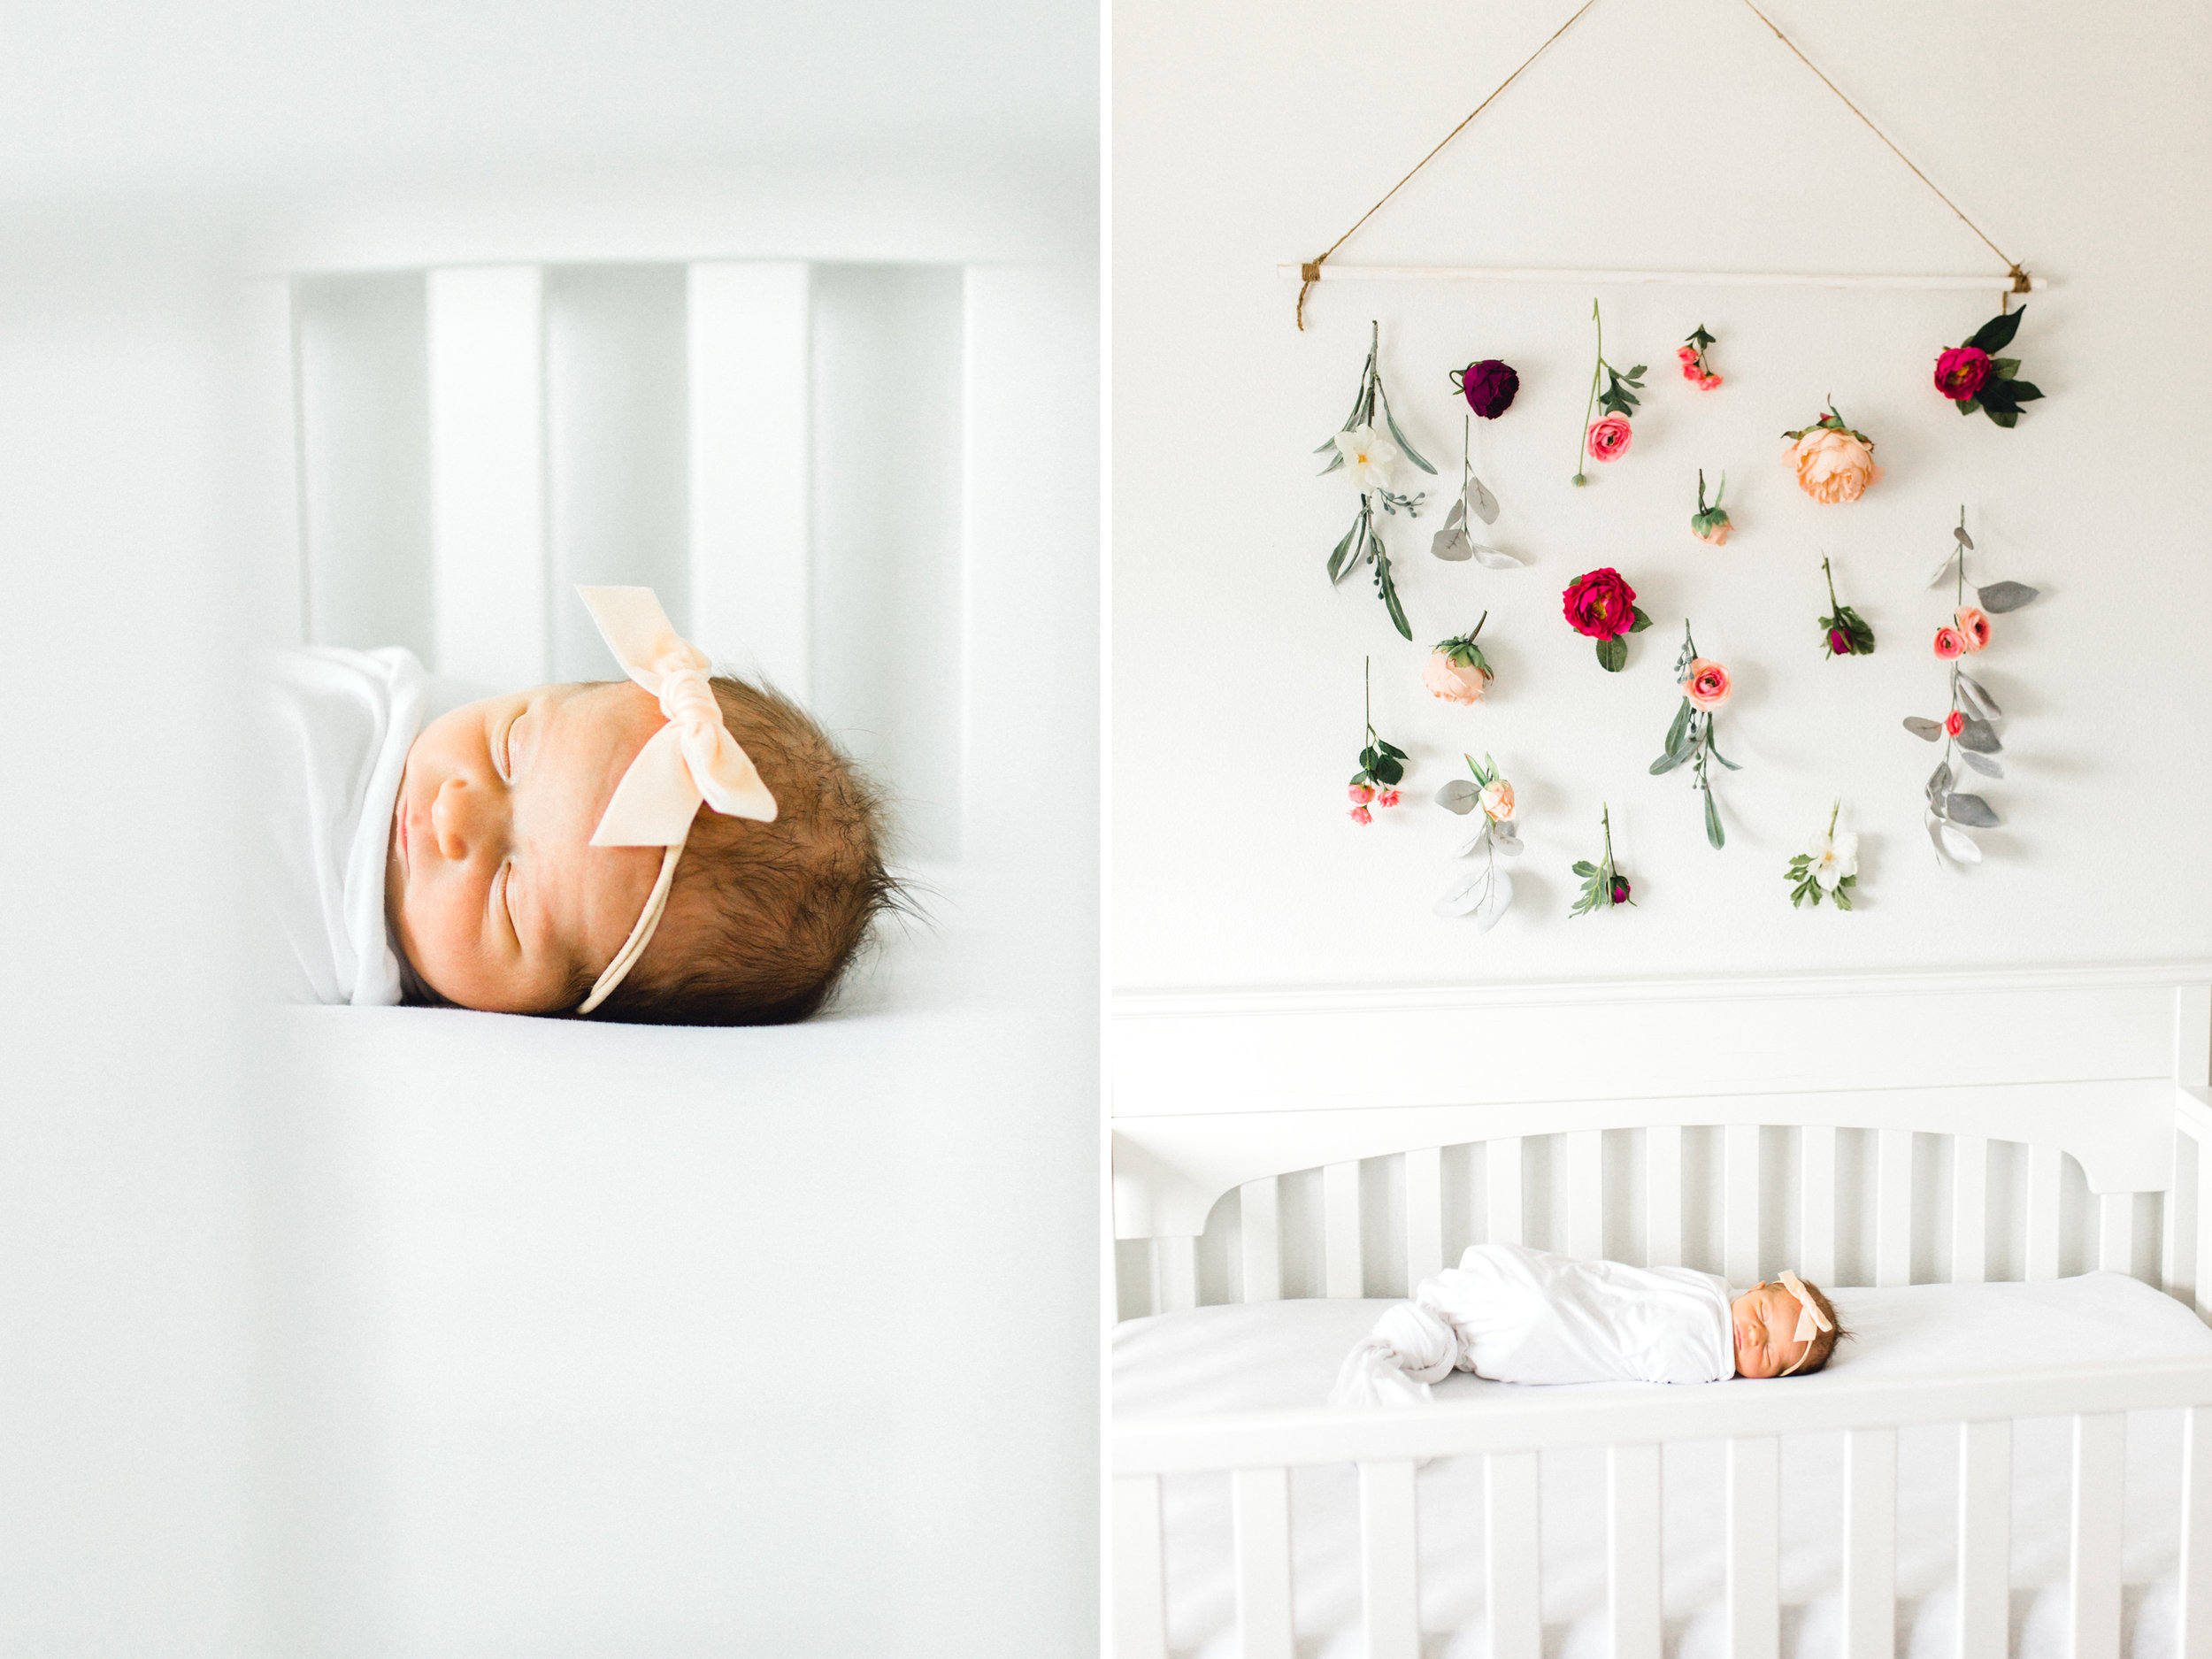 rexburg-idaho-family-newborn-photographer-anna-christine-photography-1.jpg